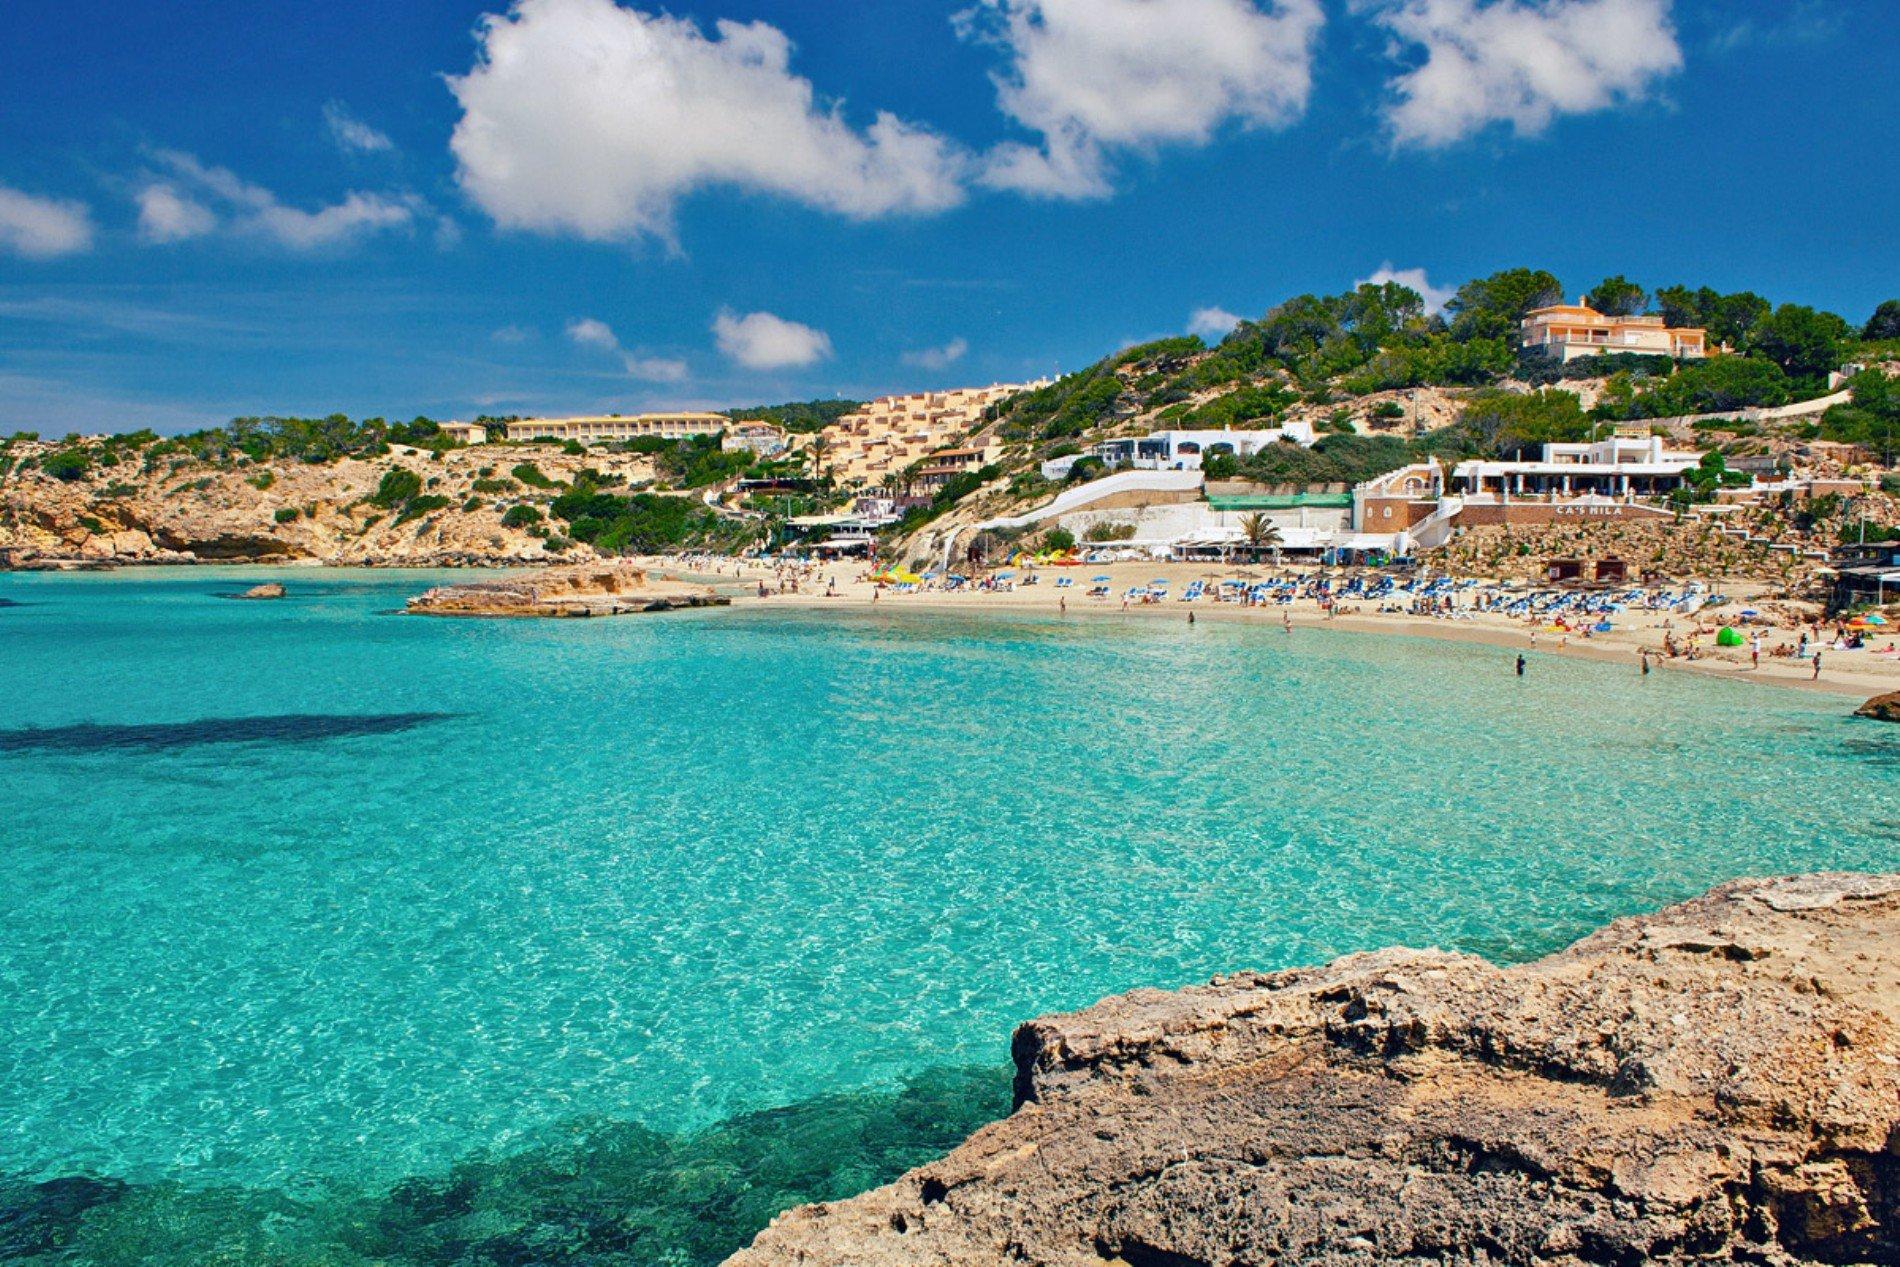 Offerte di villaggi turistici alle Baleari